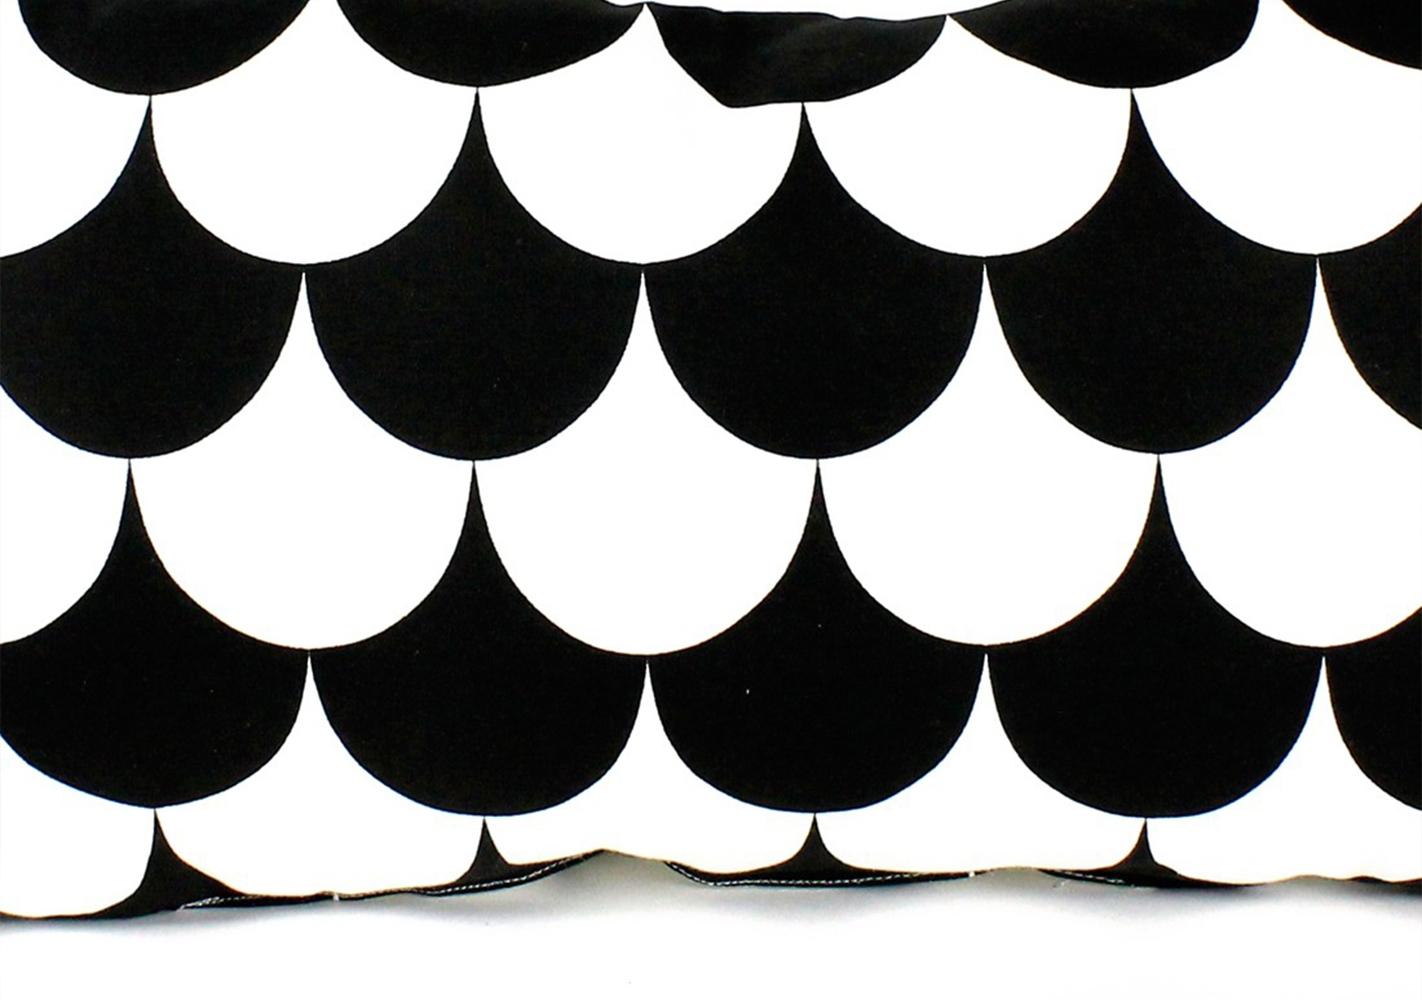 Coussin Averell - 24x52 - black scales - NOBODINOZ